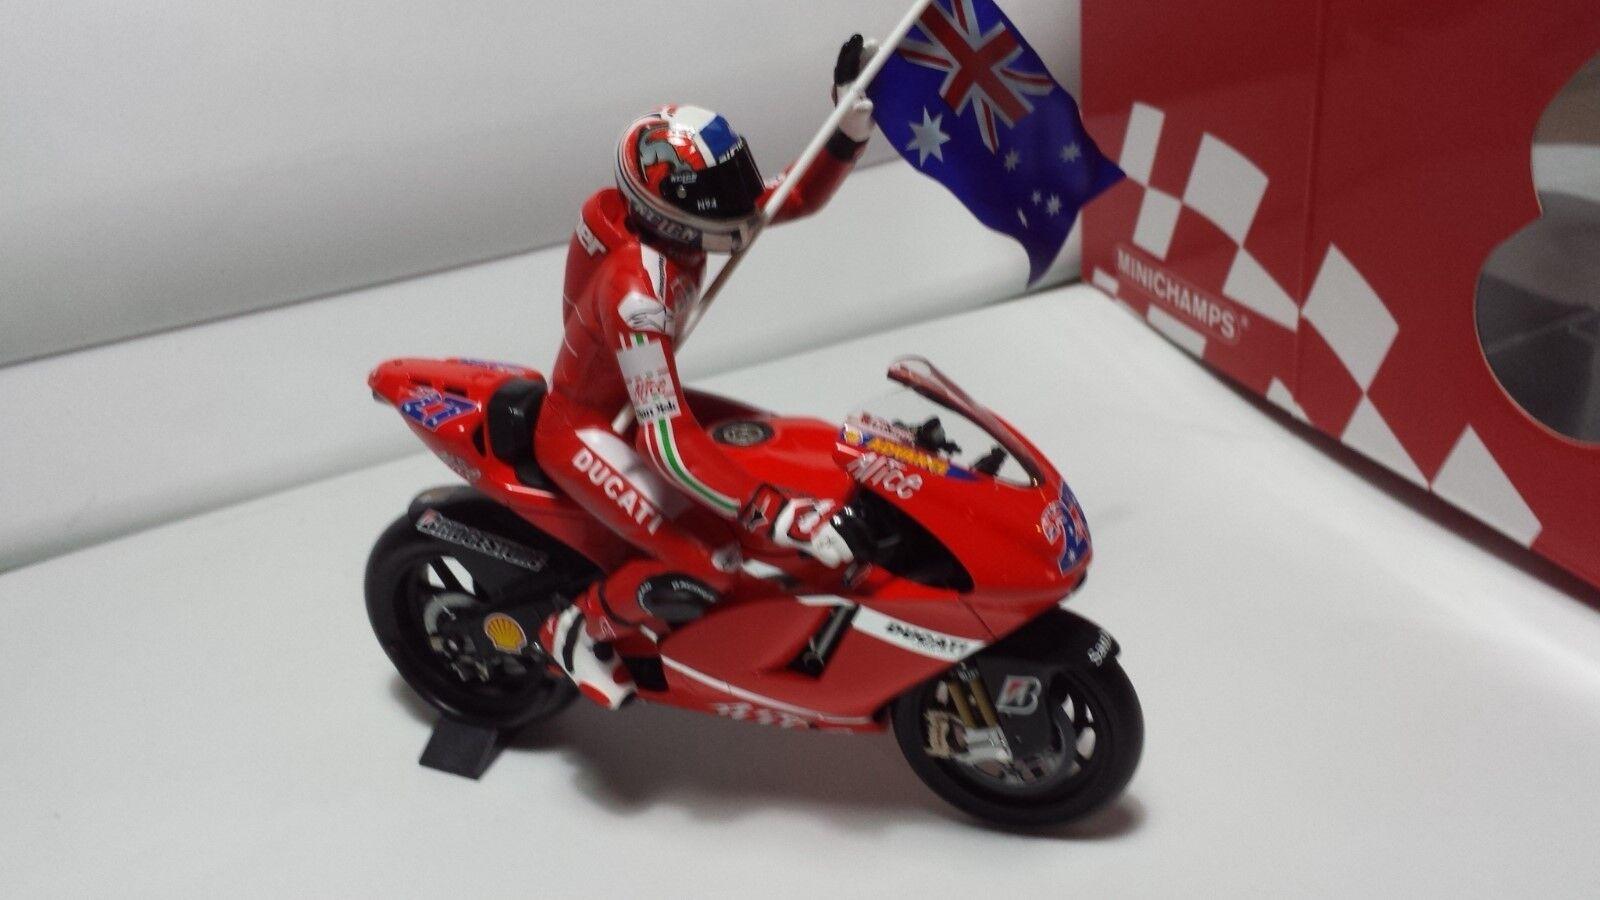 Casey Stoner. DUCATI Desmosedici MotoGP 2007 Australia. Minichamps 1 12